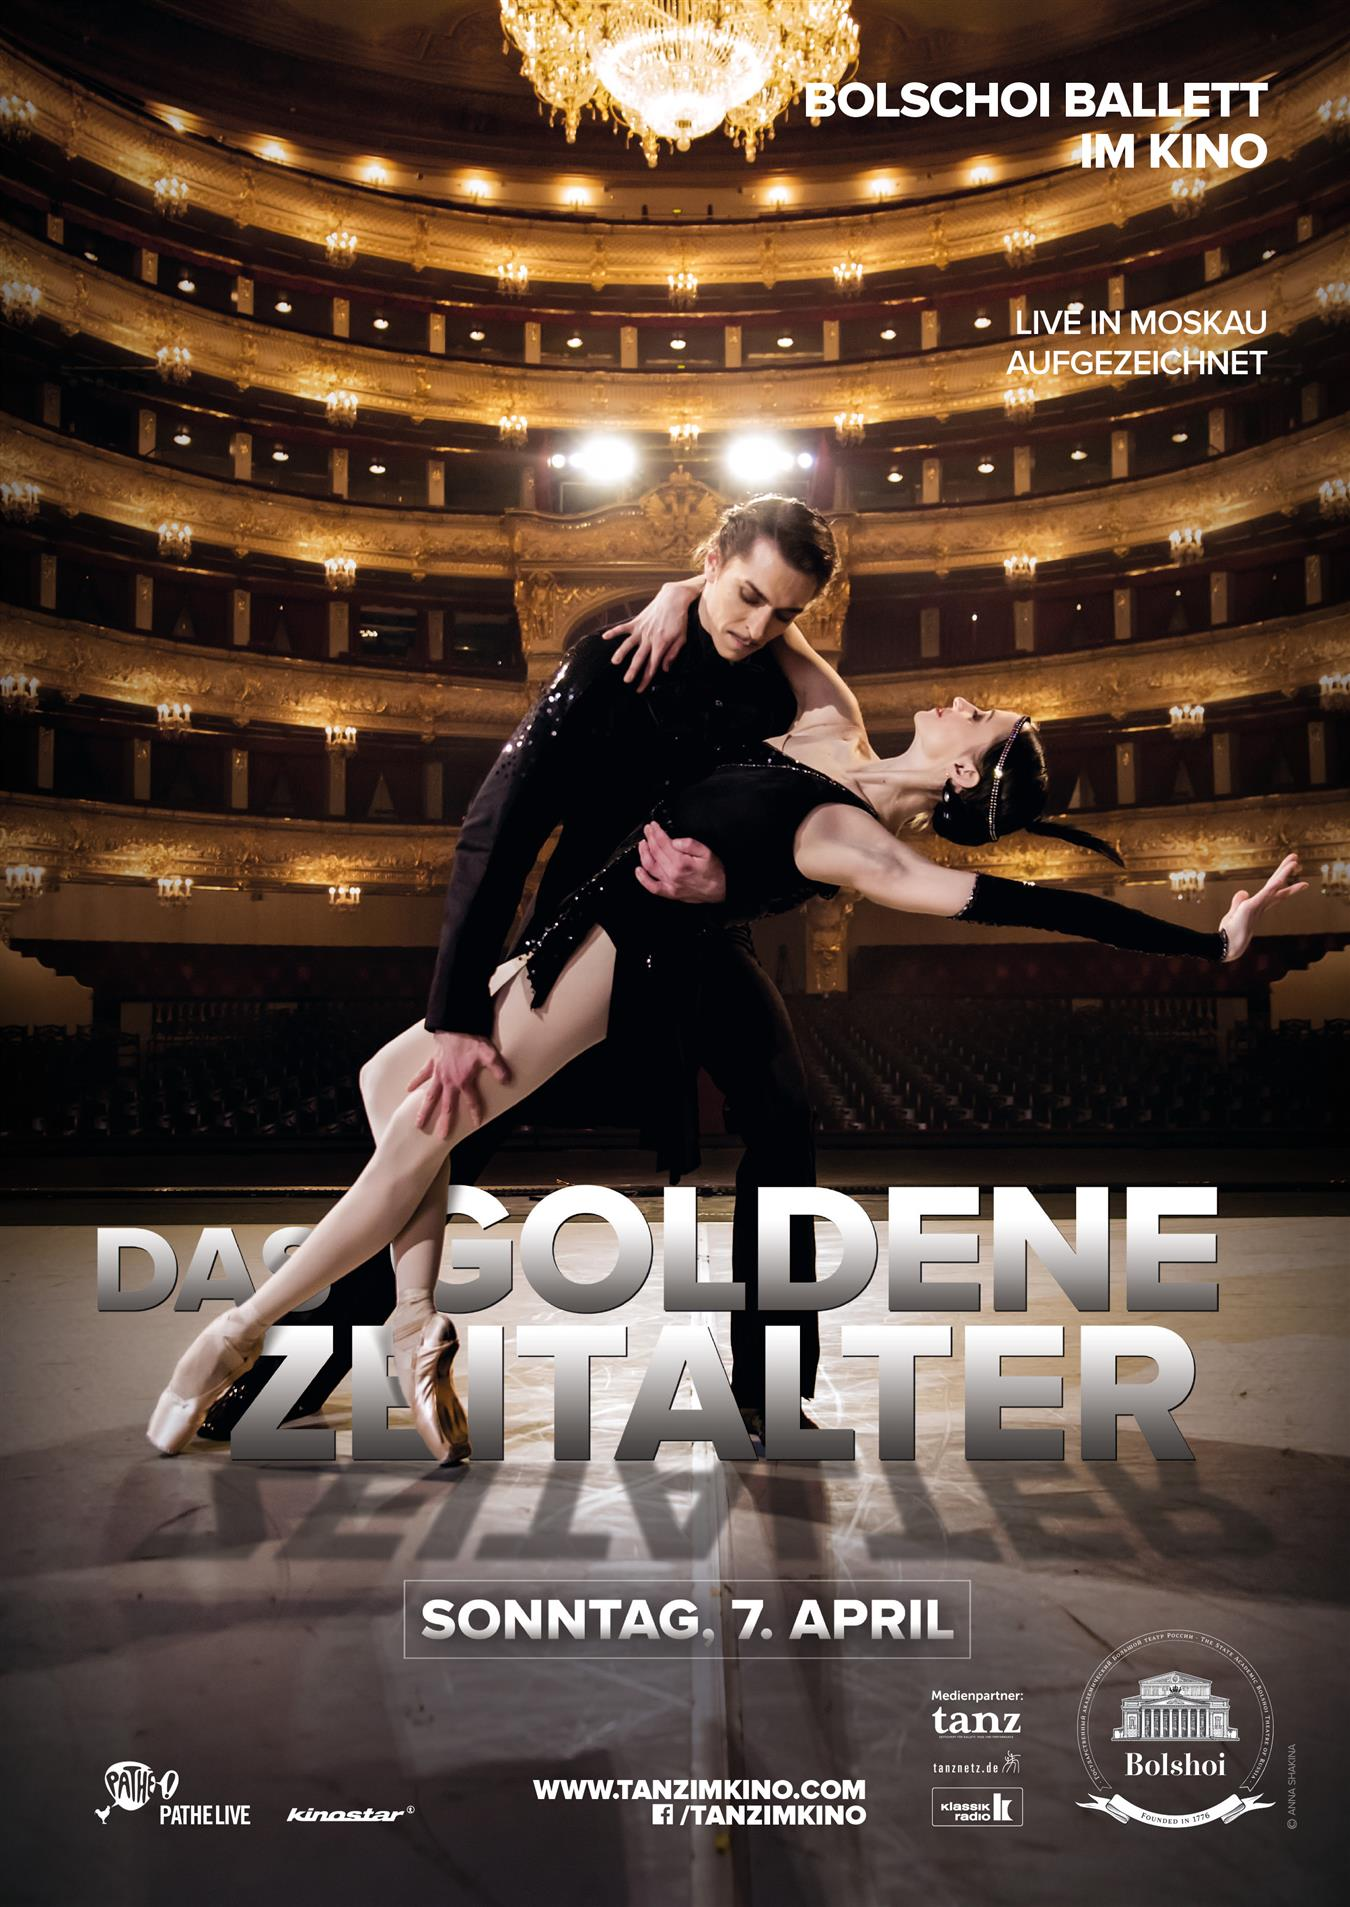 Bolschoi Ballett: DAS GOLDENE ZEITALTER